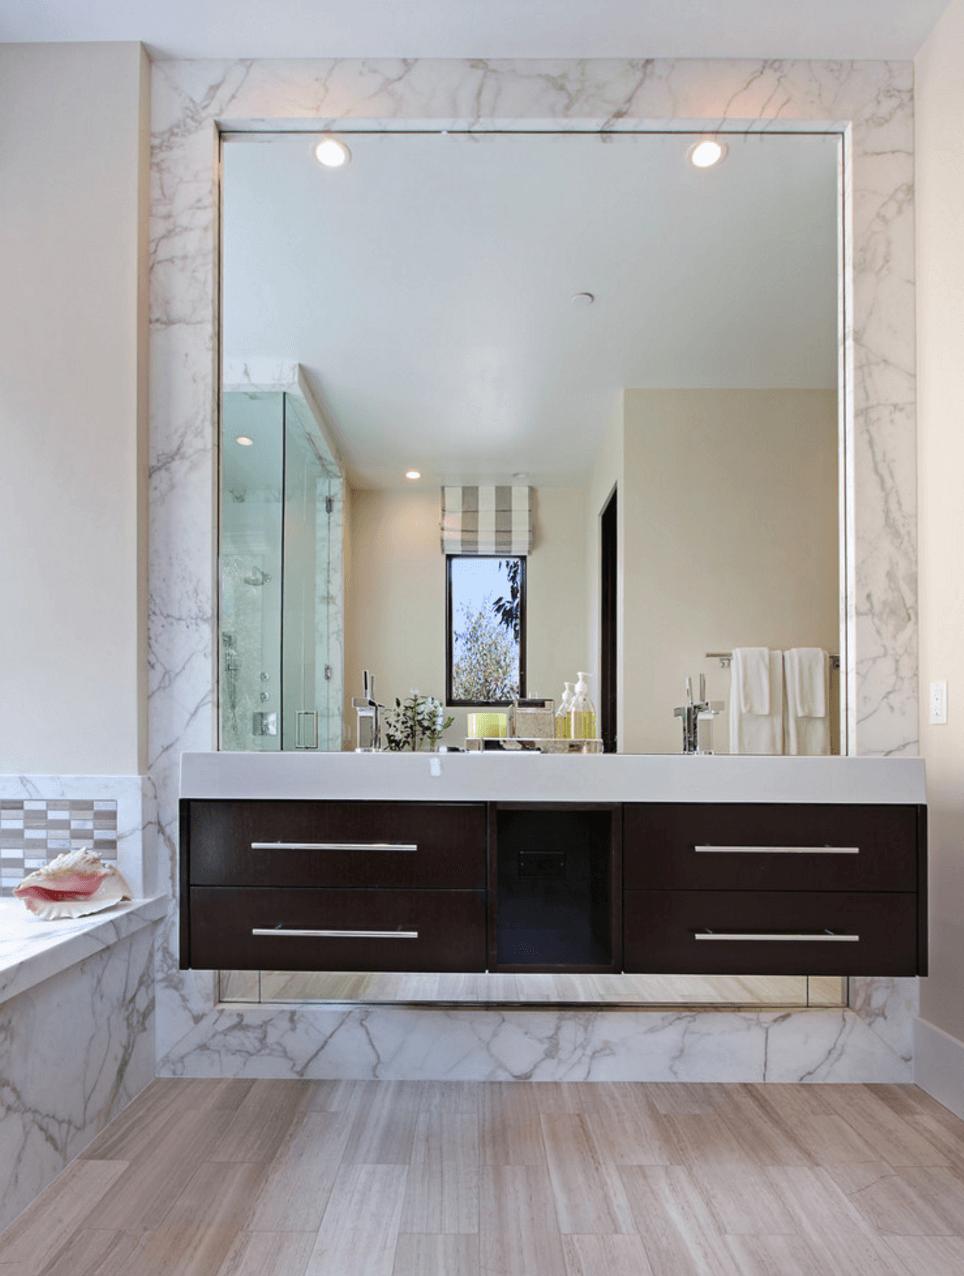 38 Bathroom Mirror Ideas To Reflect Your Style Small Bathroom